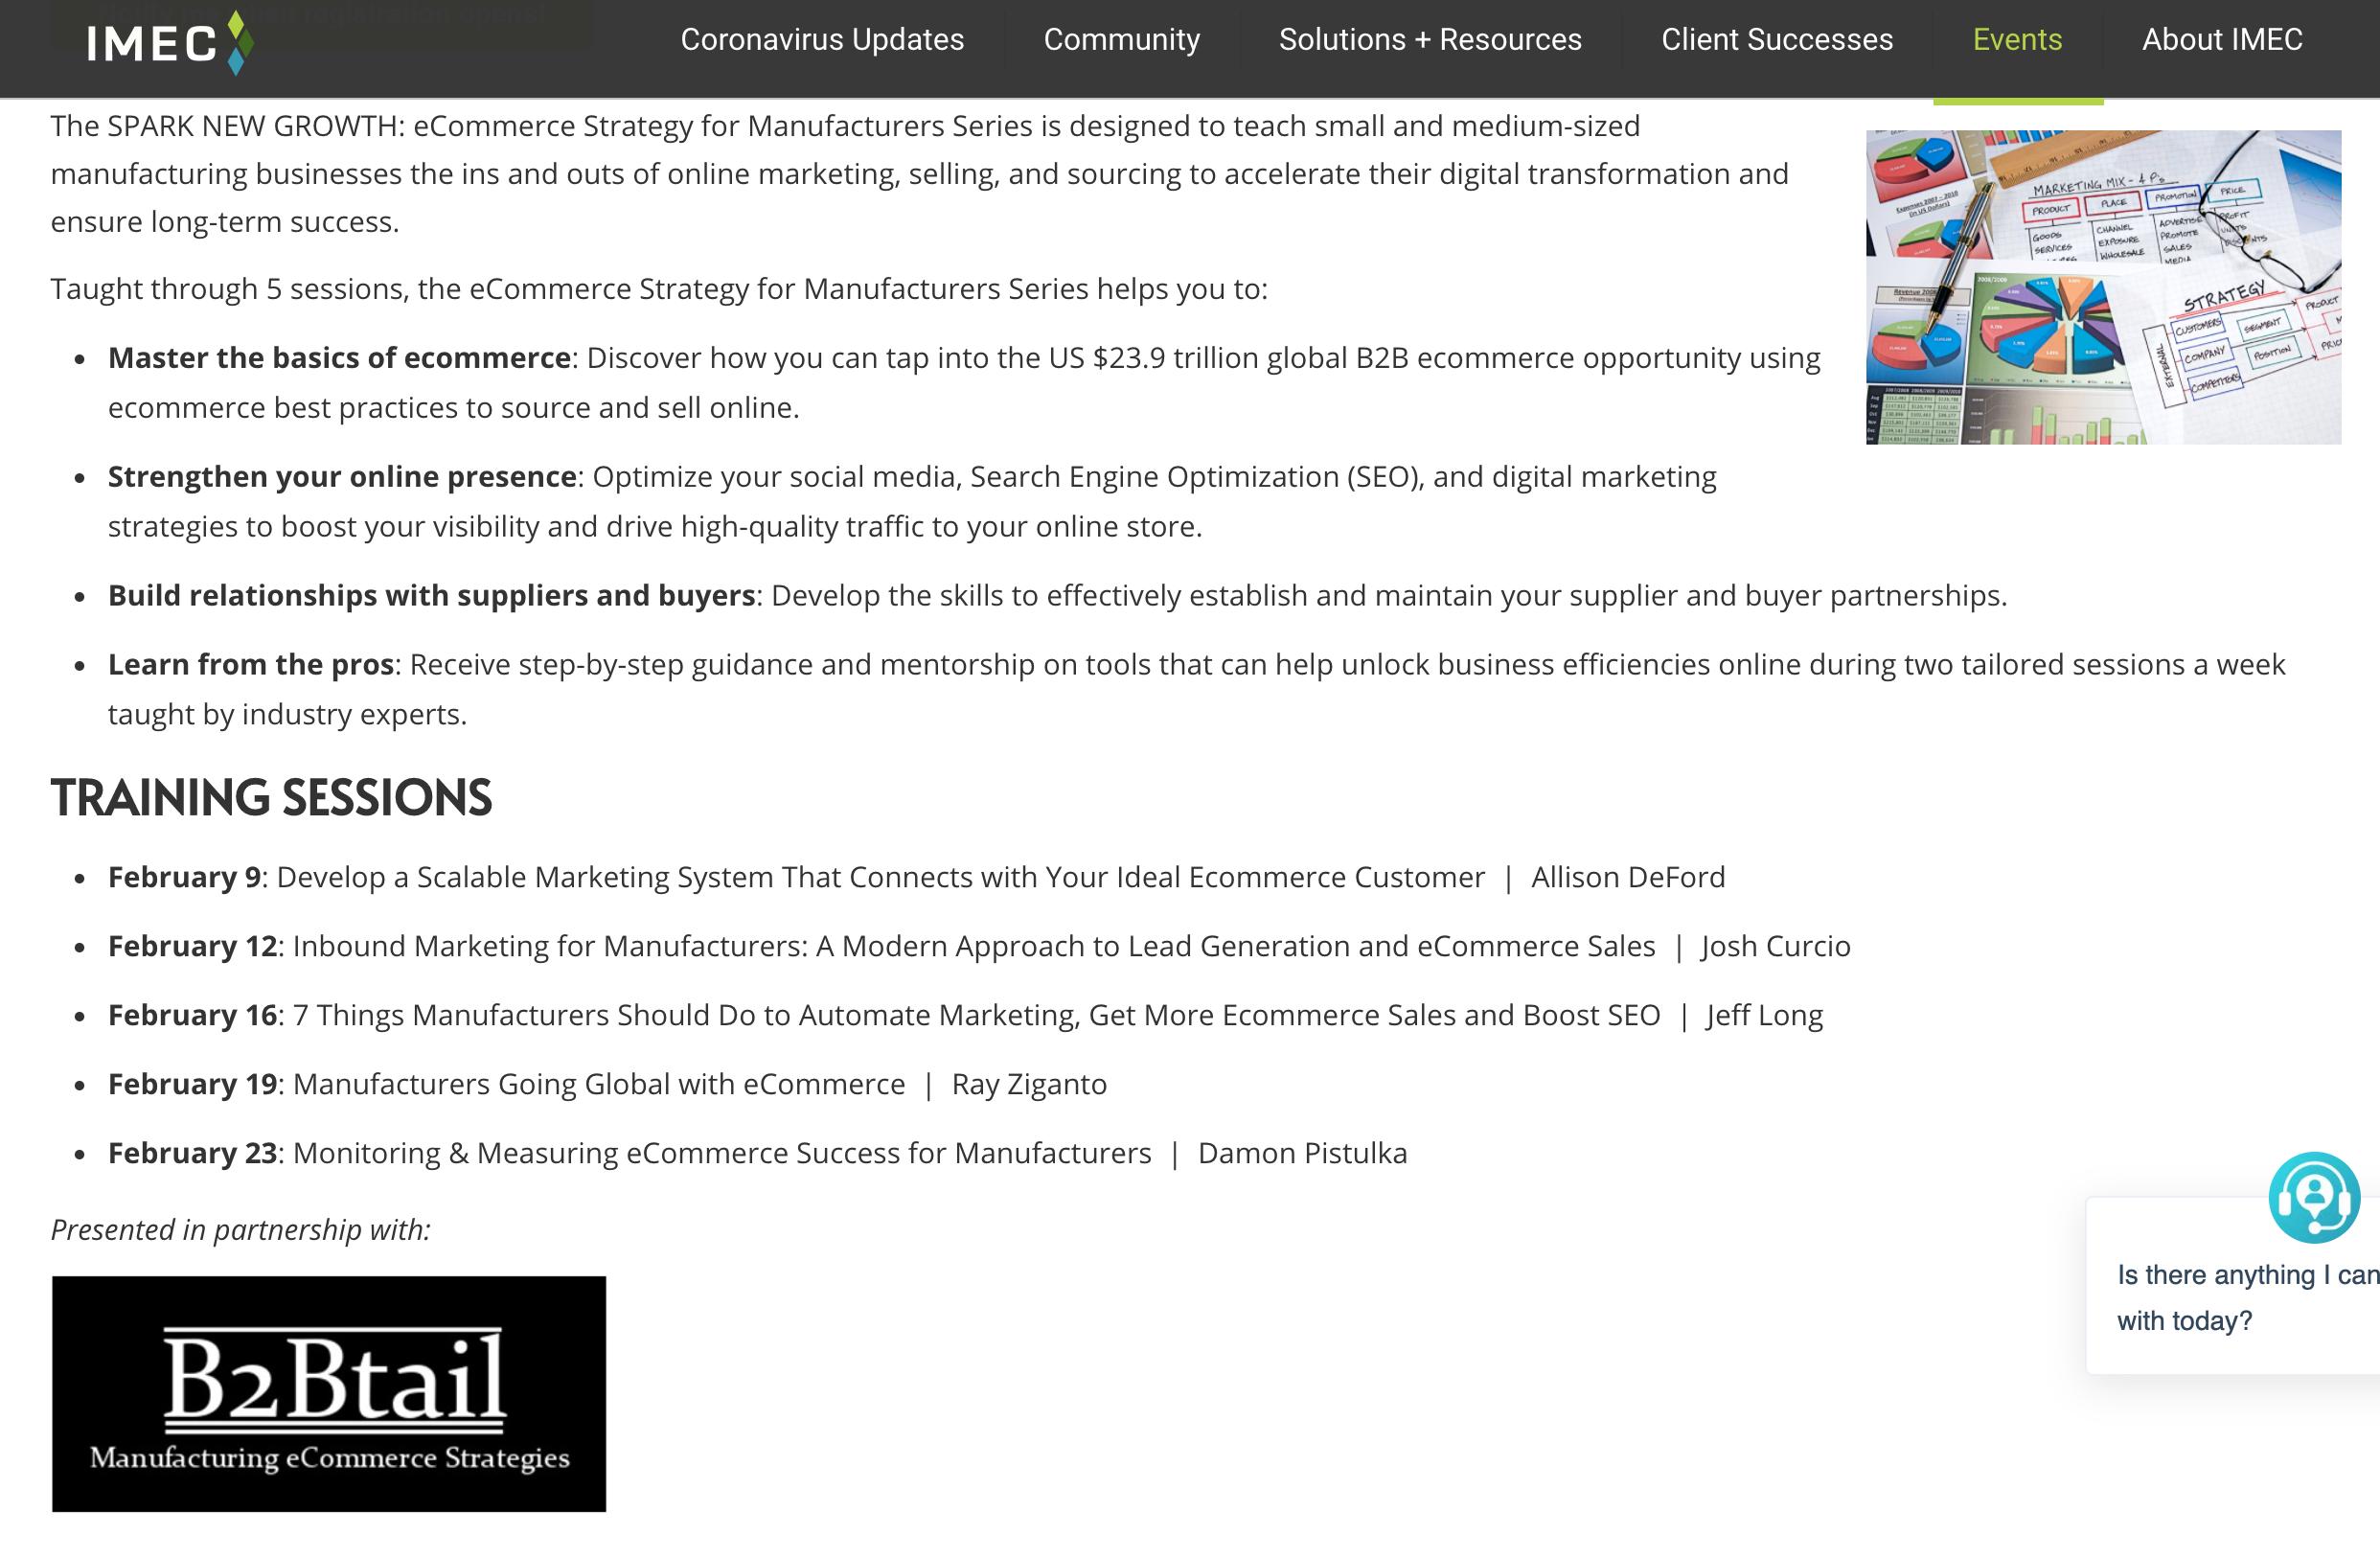 IMEC, IMEC Offers eCommerce Workshop Featuring Falconer Electronics